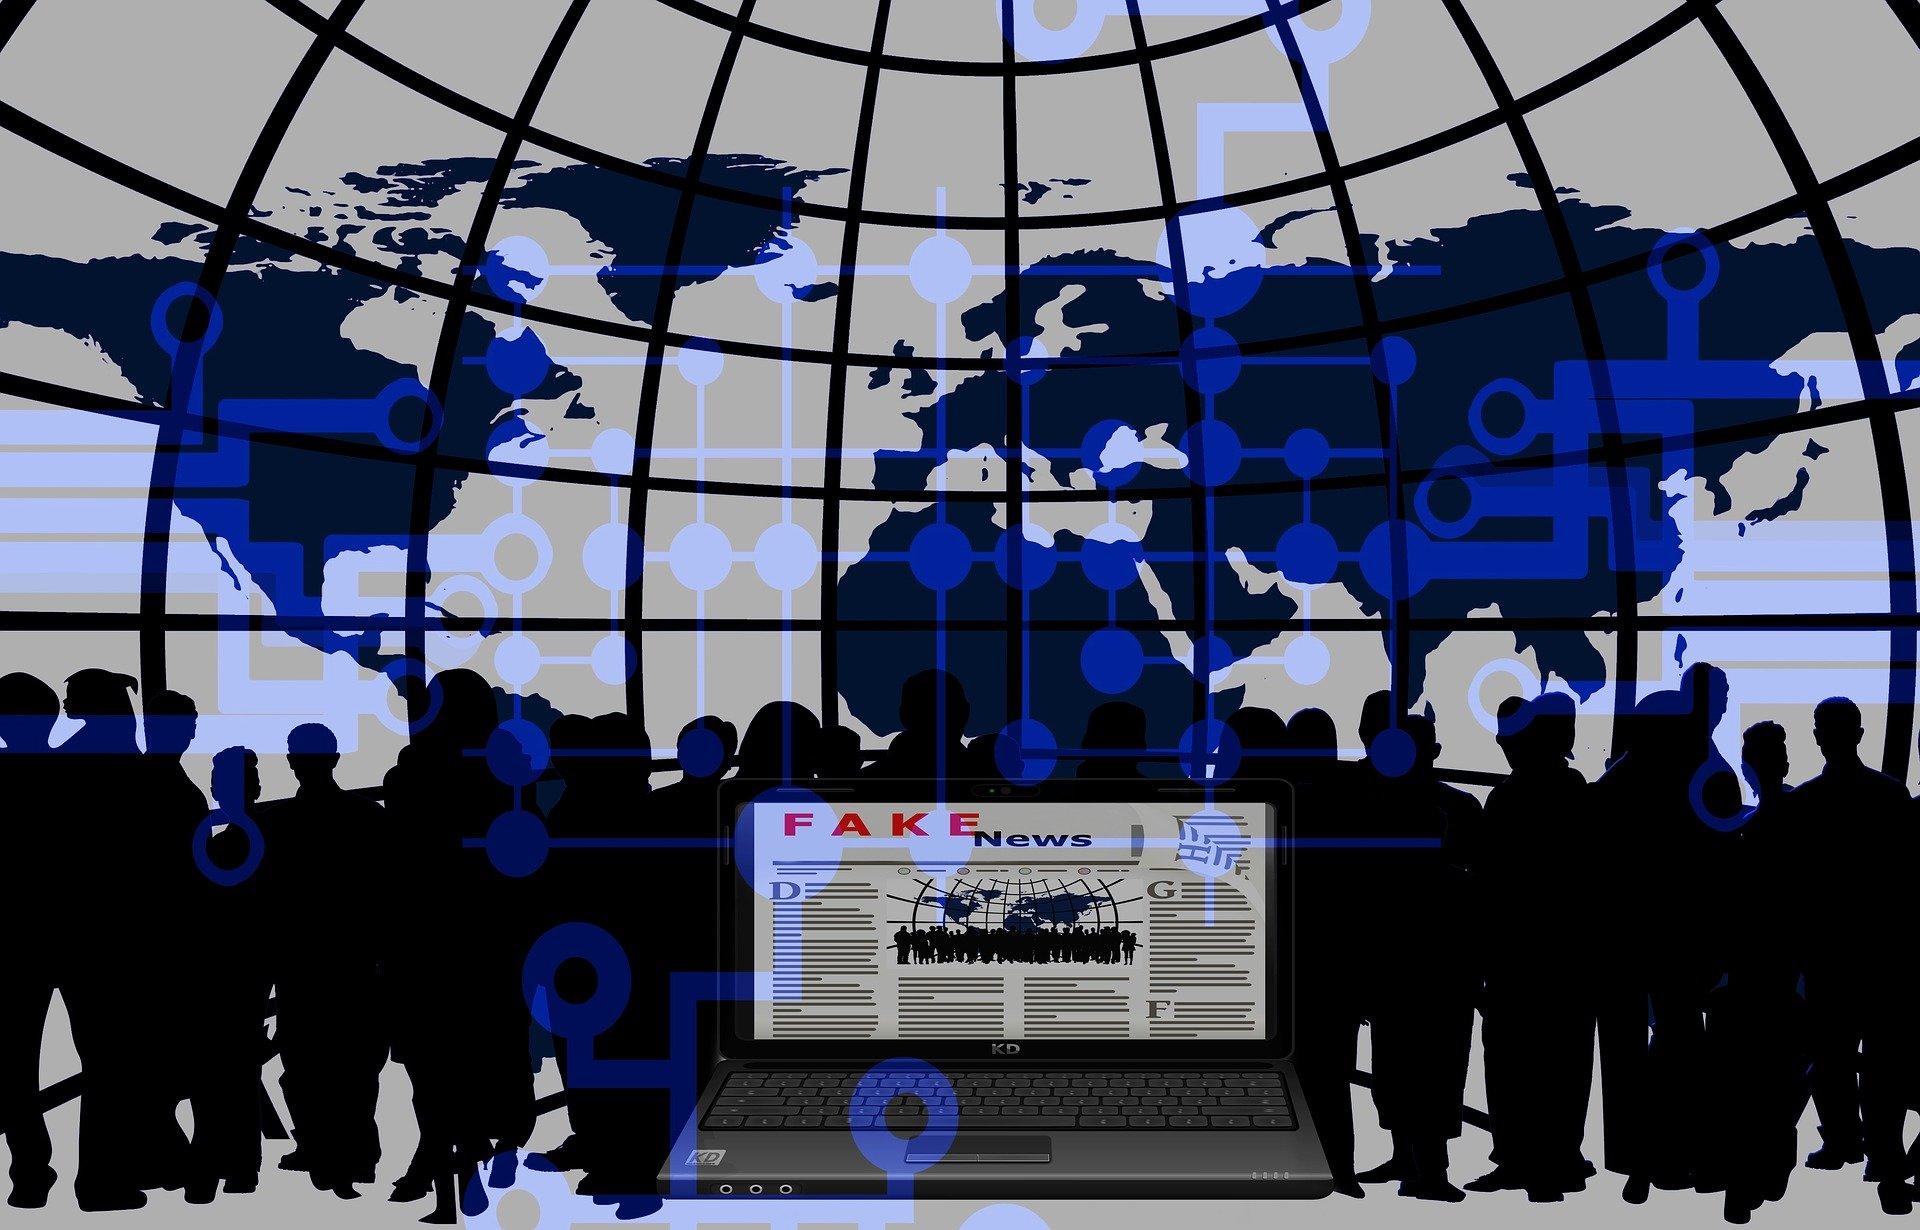 Universul digital si Fake news-urile